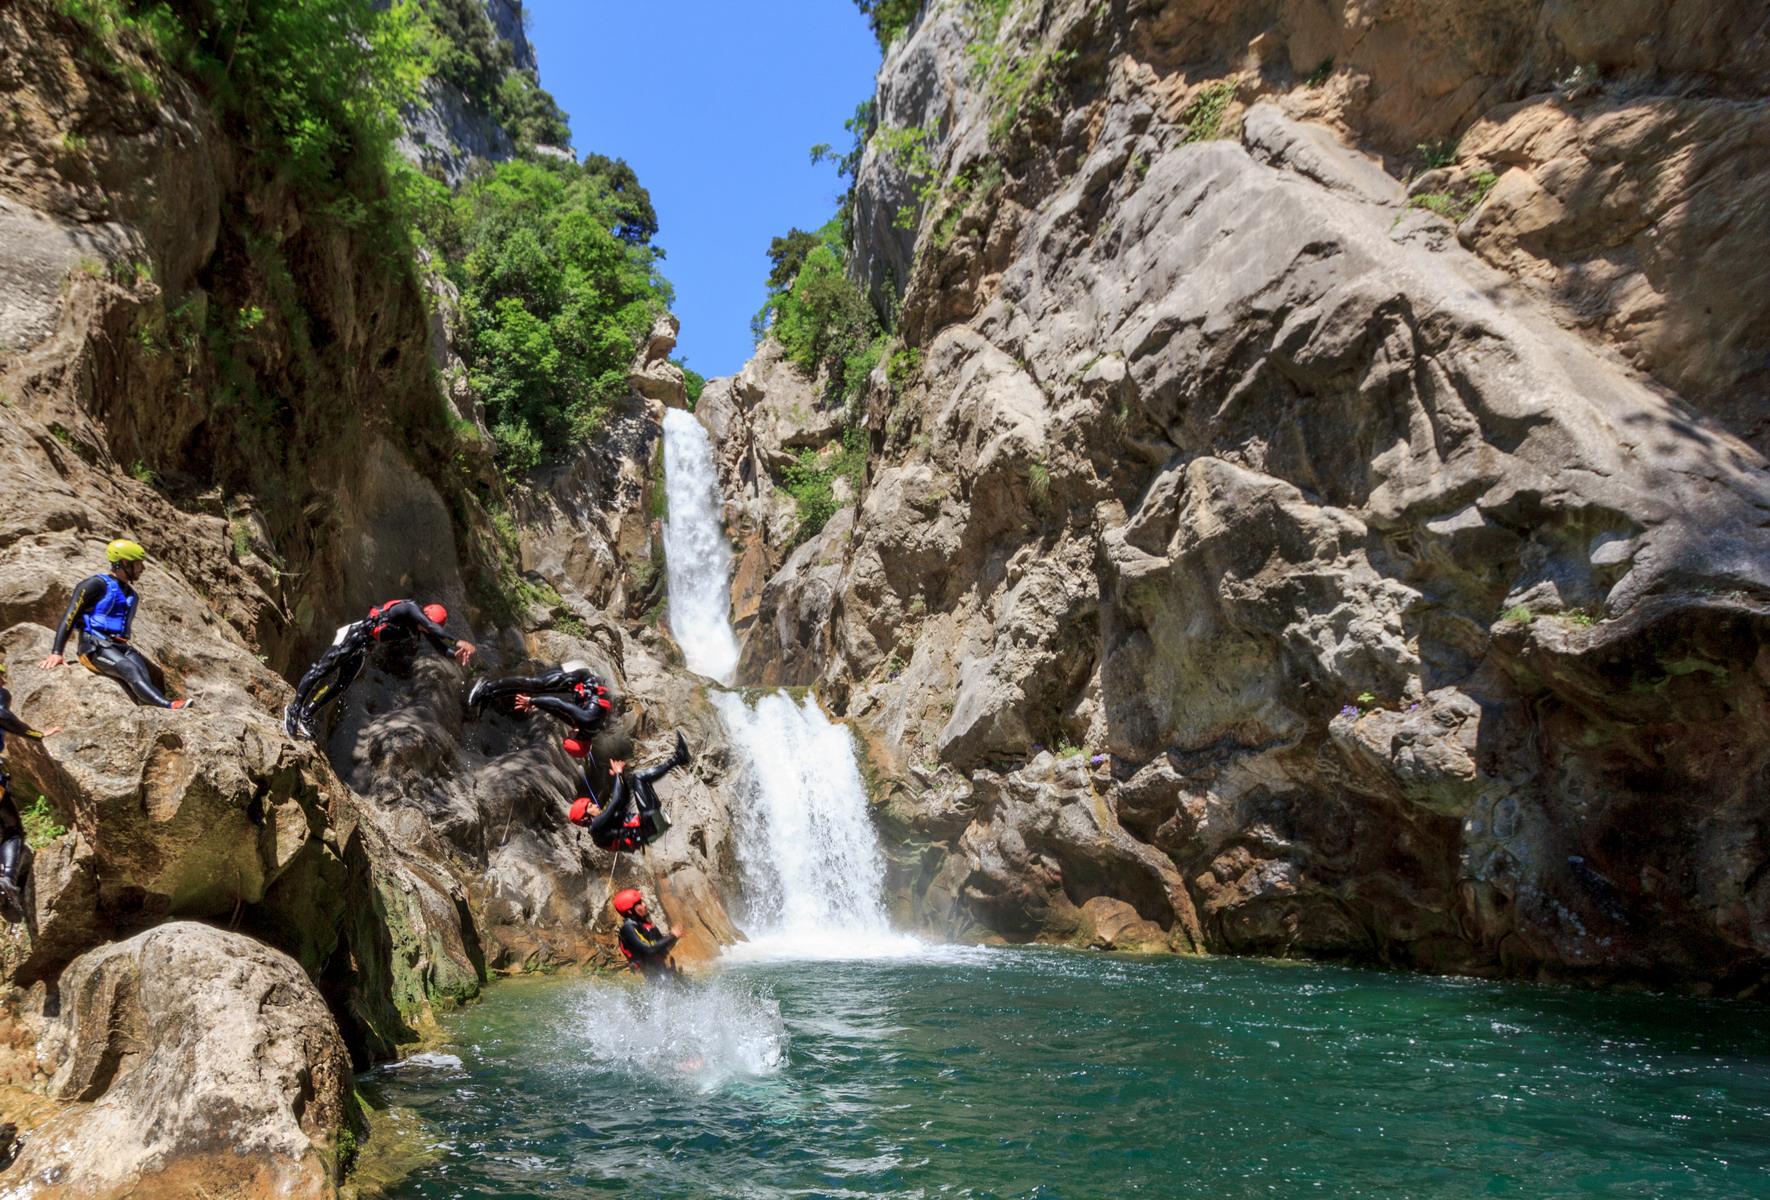 Tours in Split Croatia 2019 - Extreme Canyoning